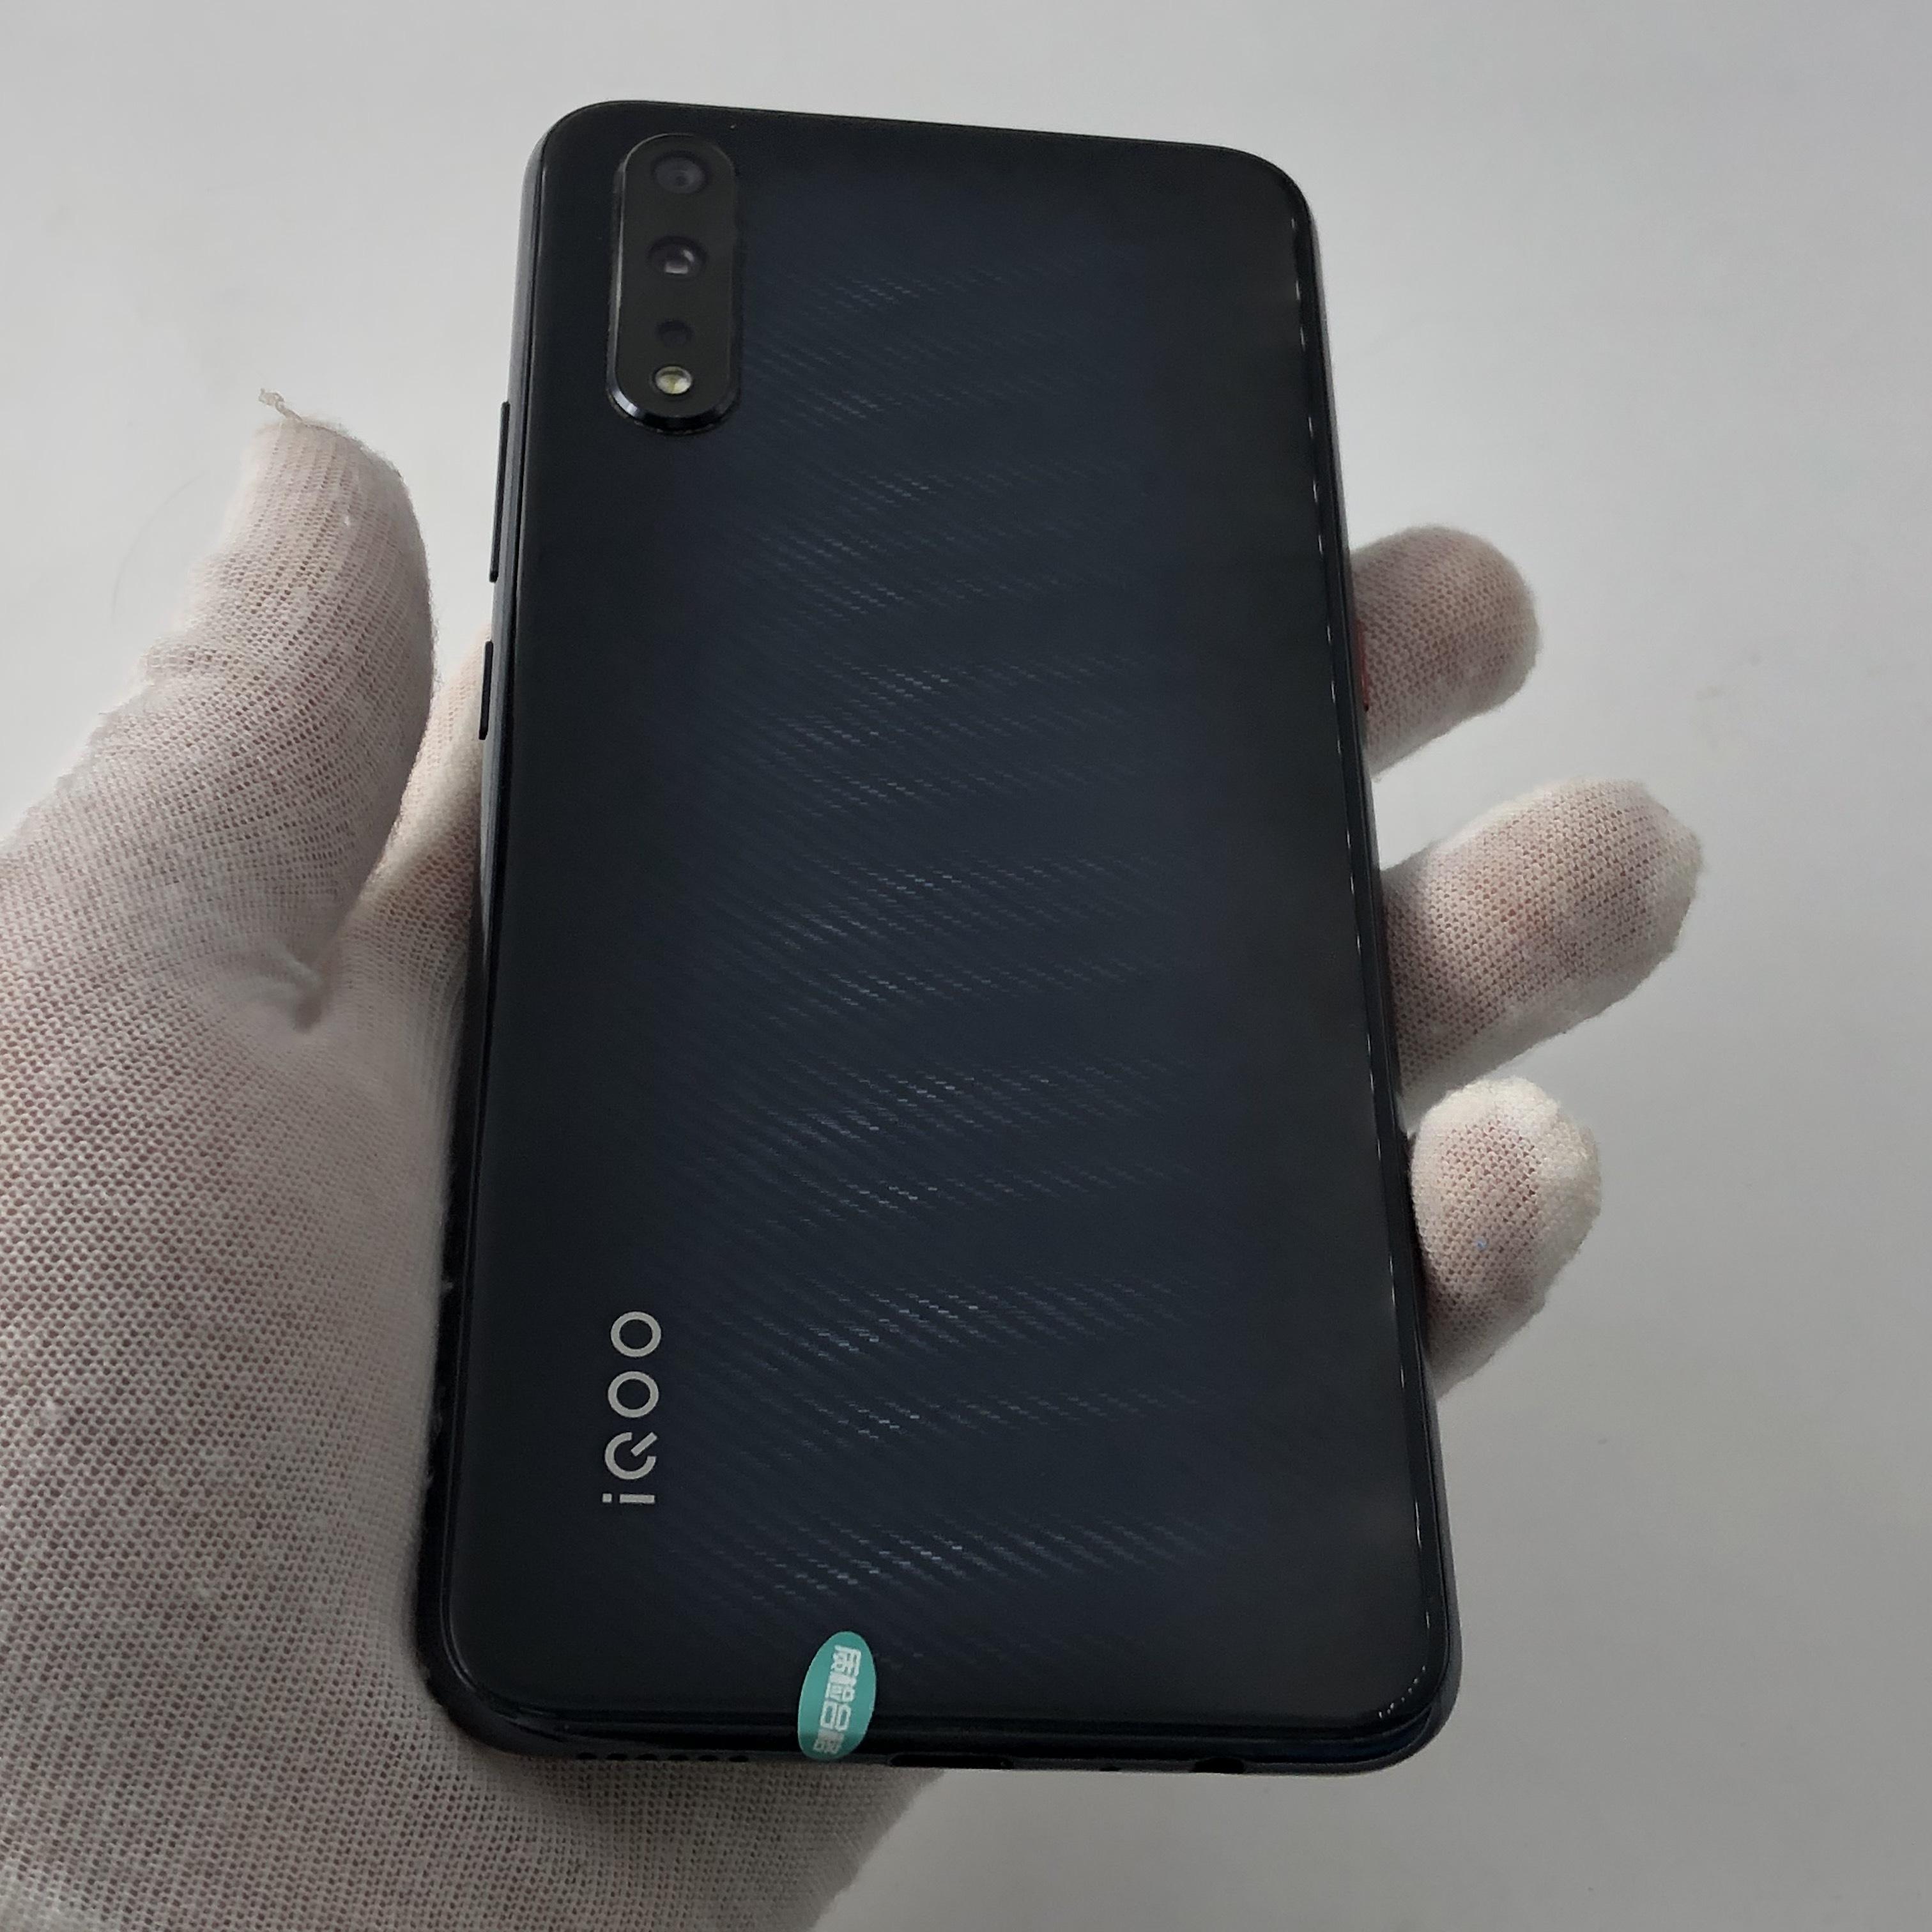 vivo【iQOO Neo】4G全网通 黑色 8G/128G 国行 7成新